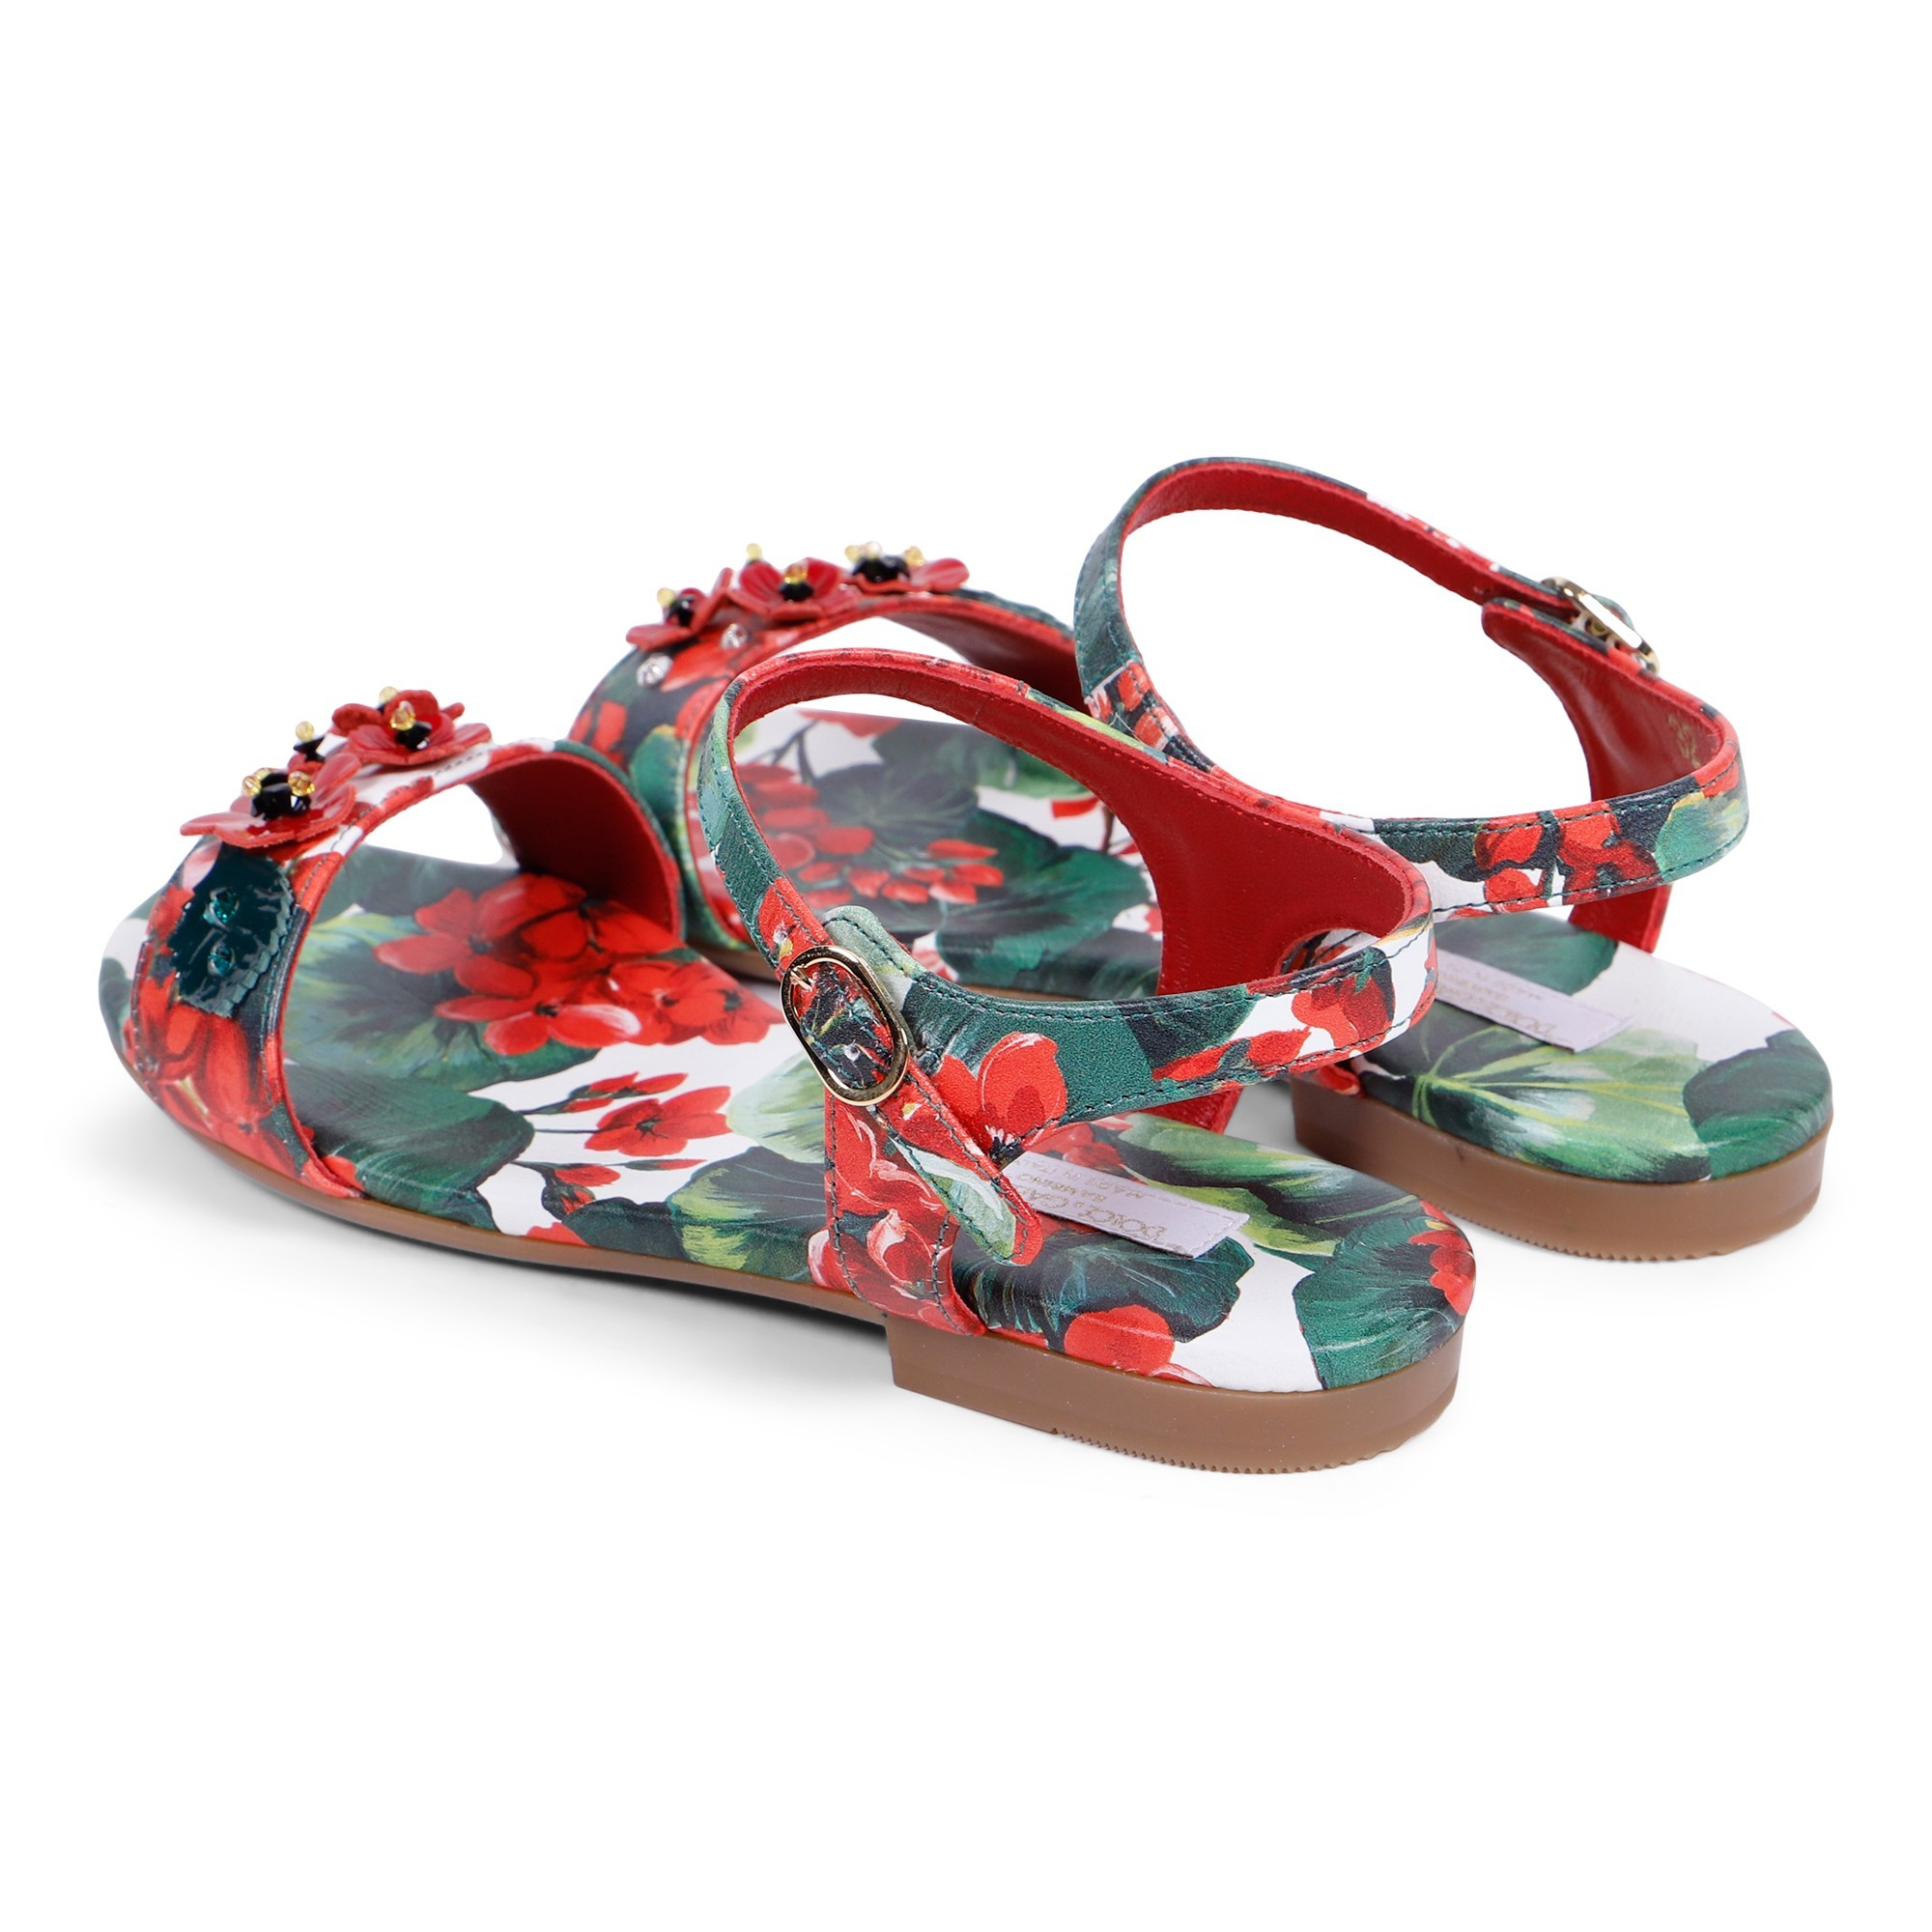 Dolce \u0026 Gabbana Girls Ankle Sandals in